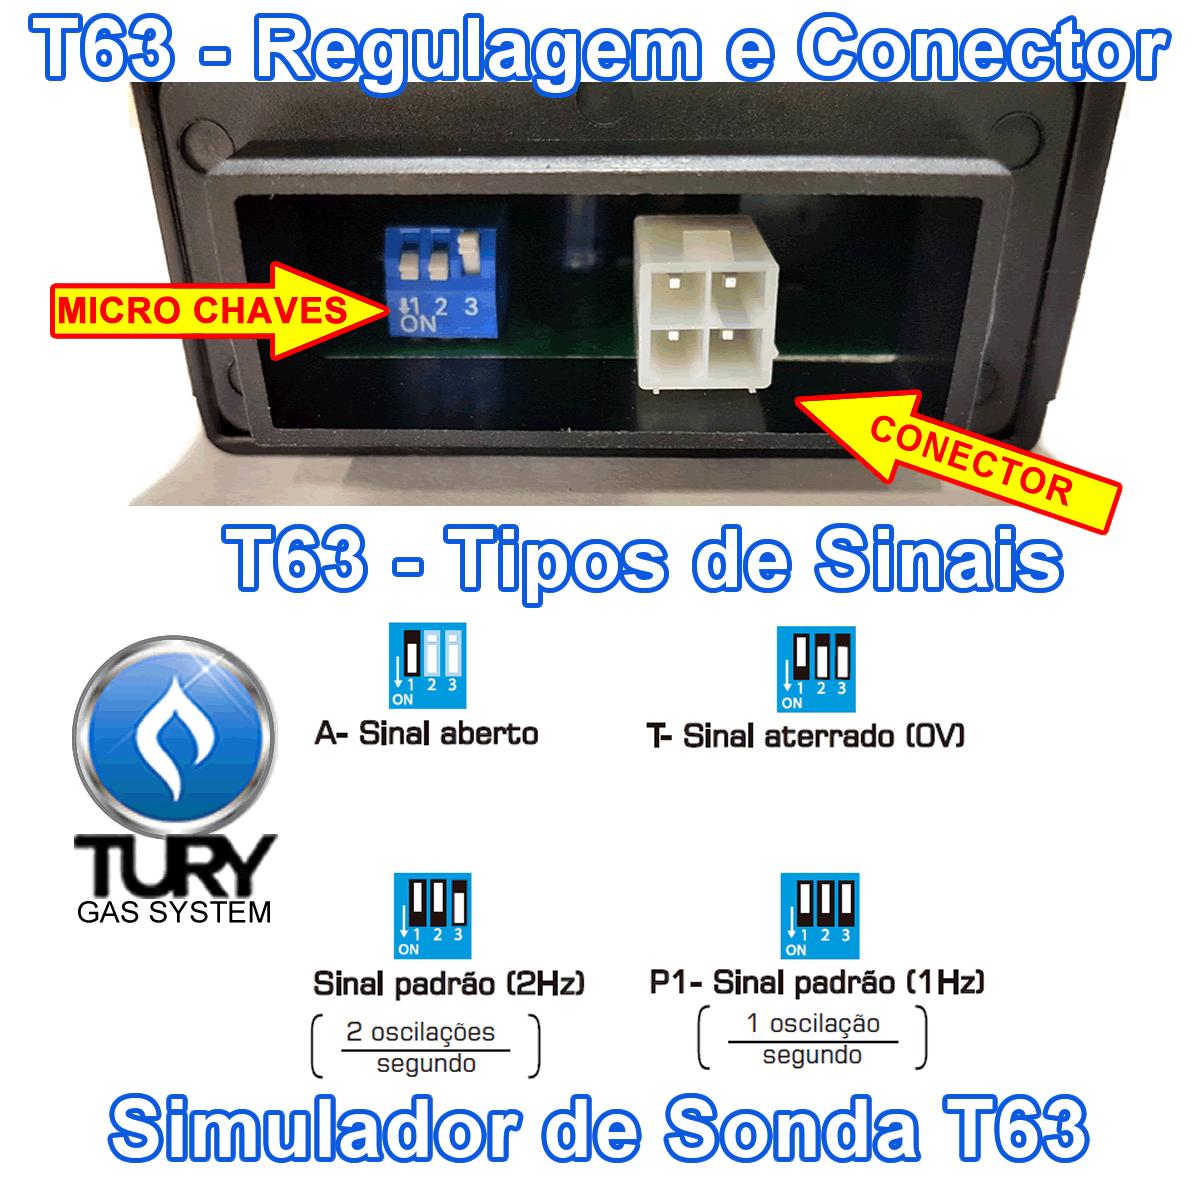 Chave Comutadora T1000A e Simulador de Sonda T63 TURY GAS